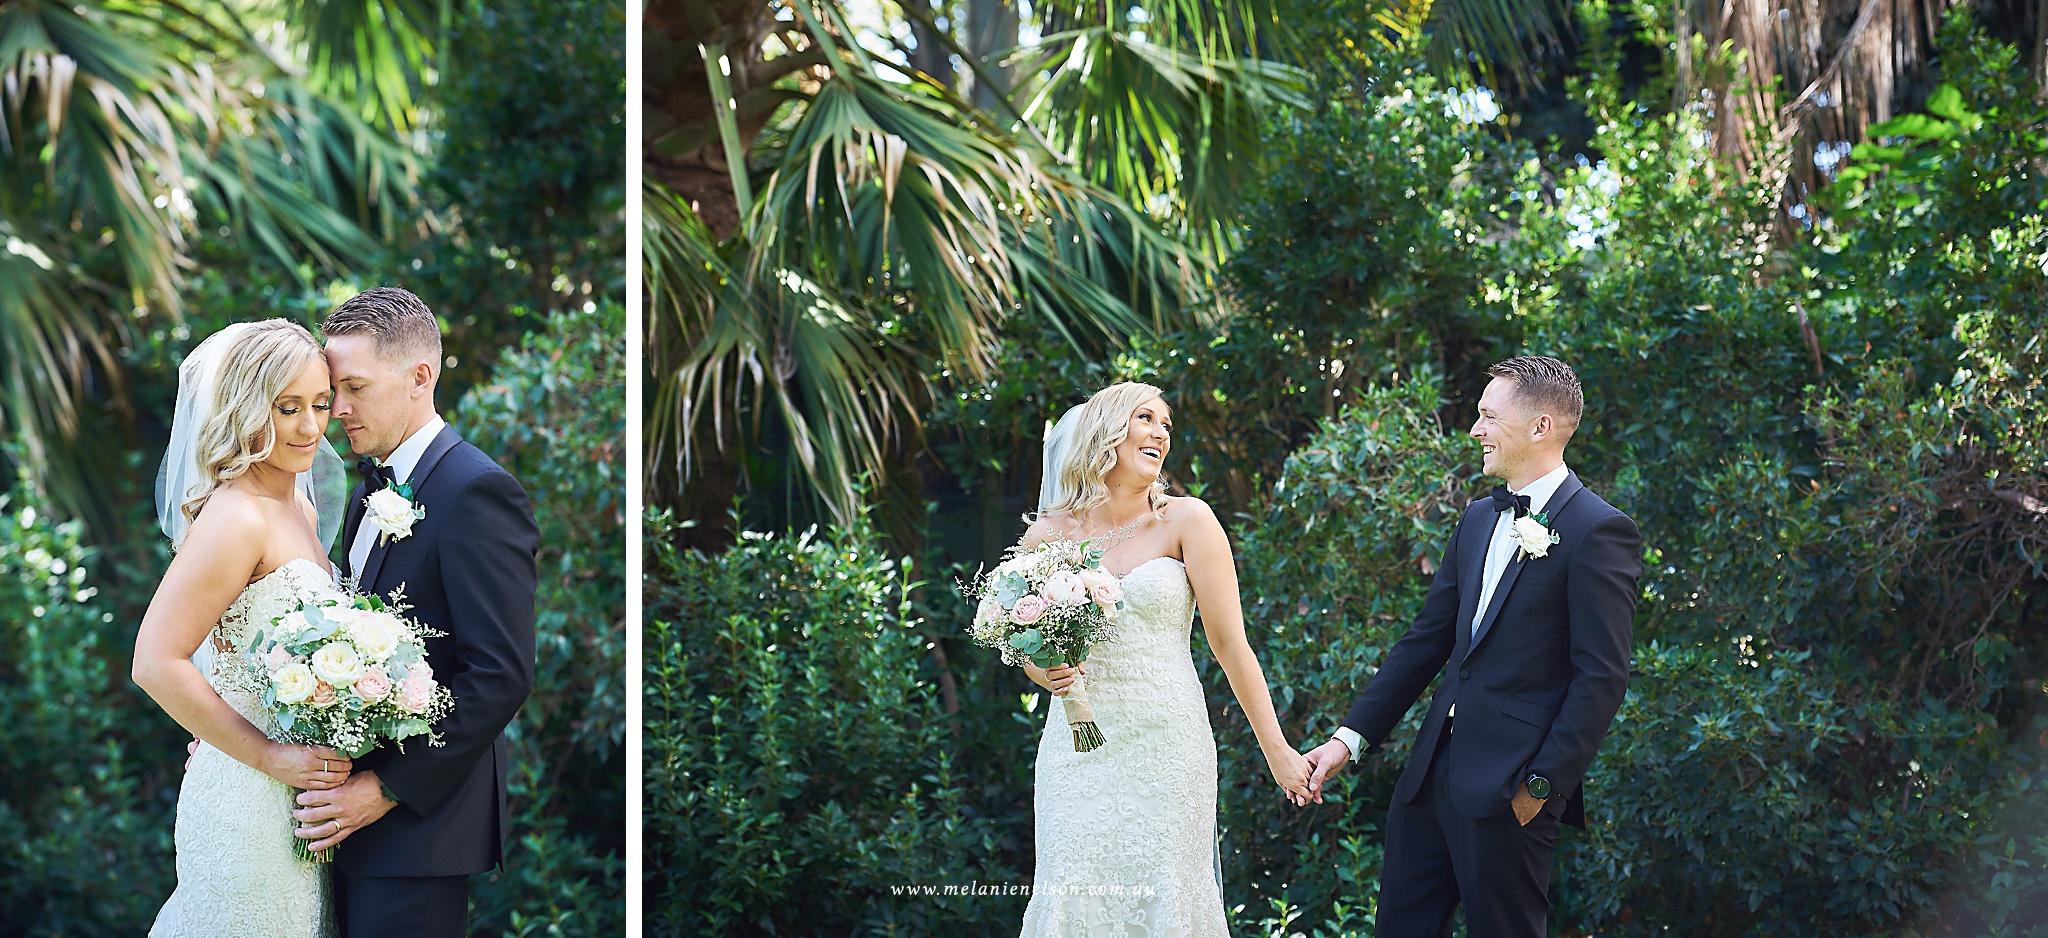 adelaide_botanic_gardens_wedding_0034.jpg